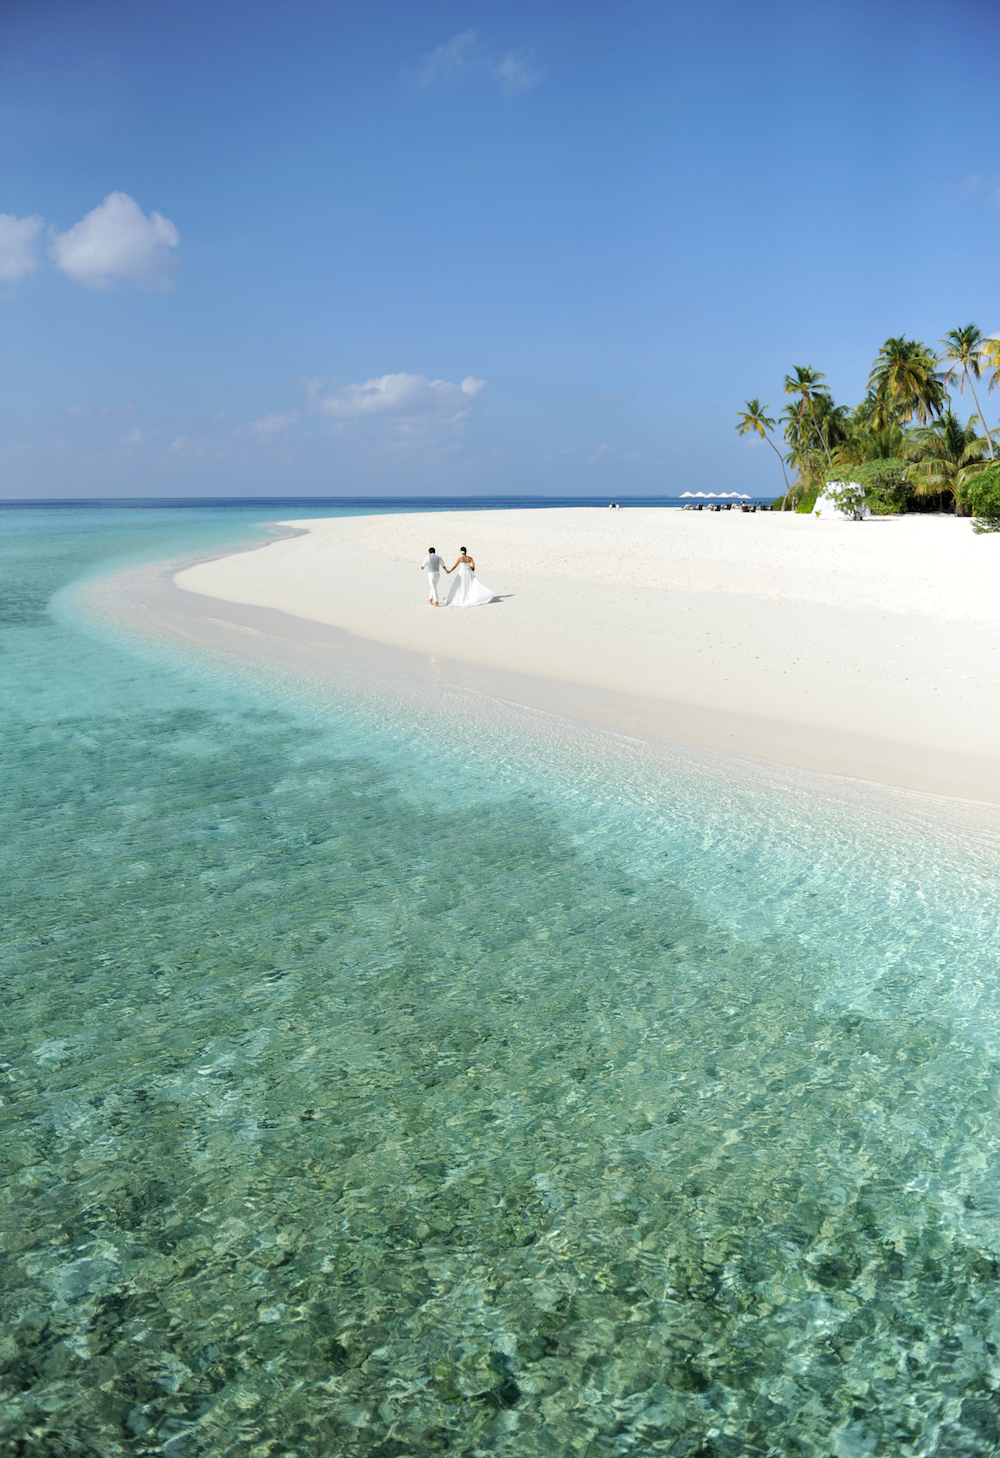 Honeymoon in Maldives - Couple walking on beach